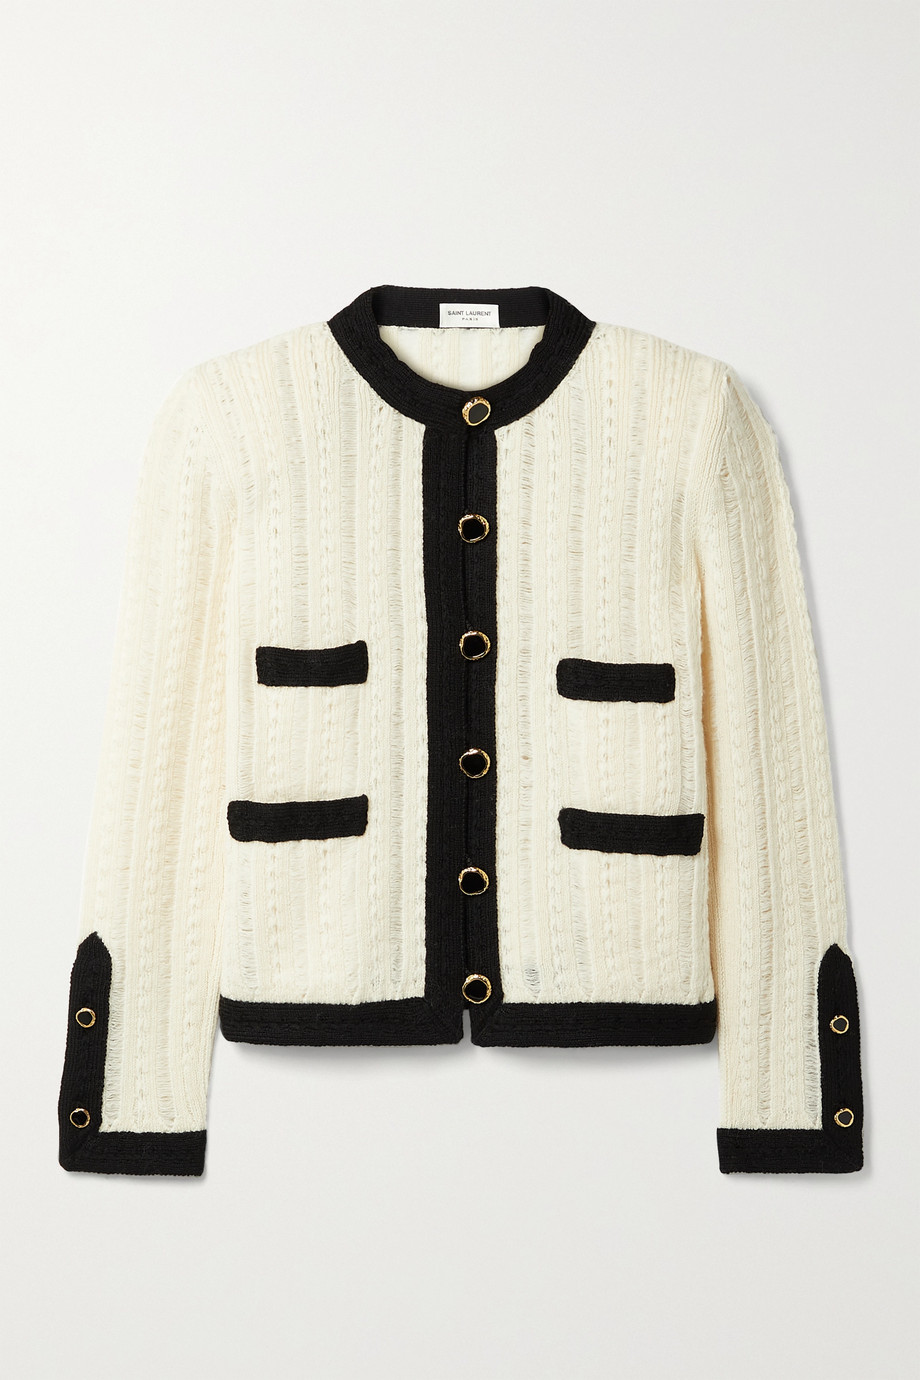 SAINT LAURENT Two-tone ribbed wool jacket